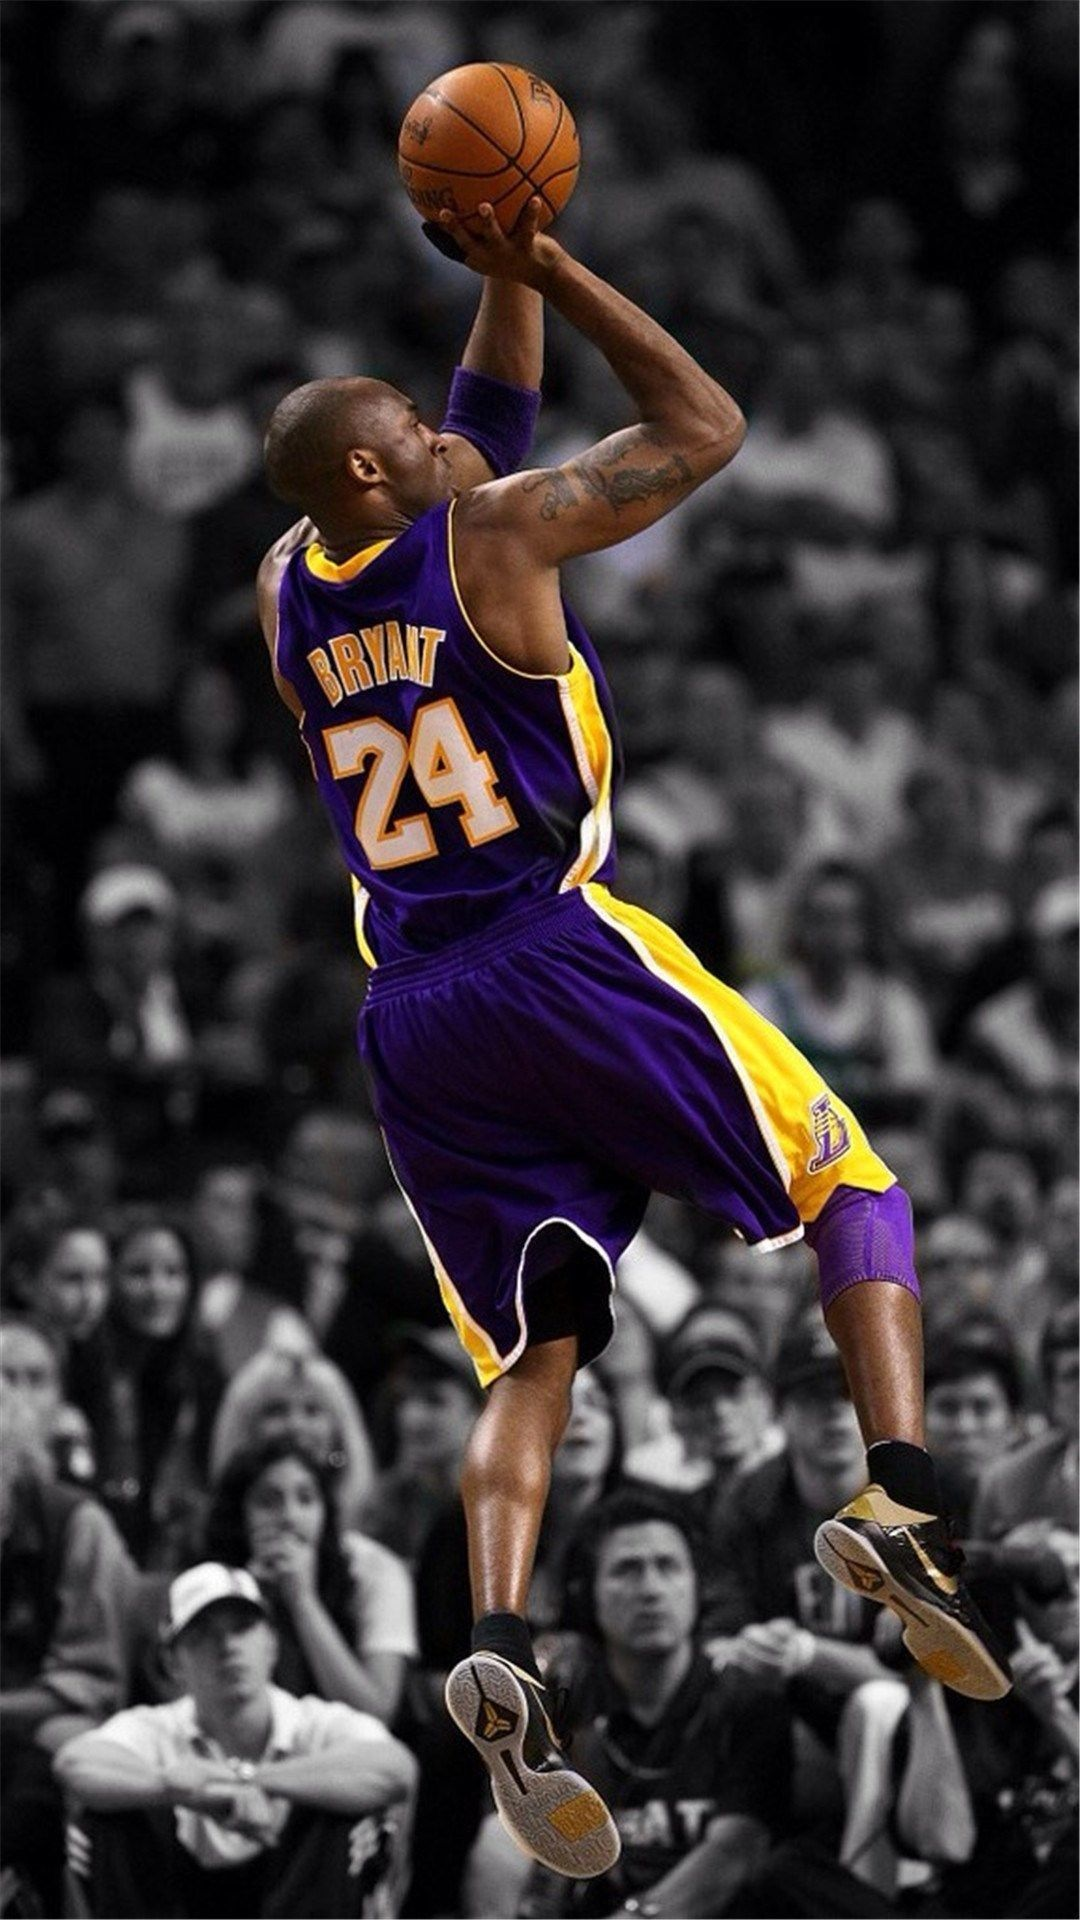 Dunk Kobe Bryant Wallpaper Ios Kobe Bryant Dunk Kobe Bryant Wallpaper Kobe Bryant Black Mamba